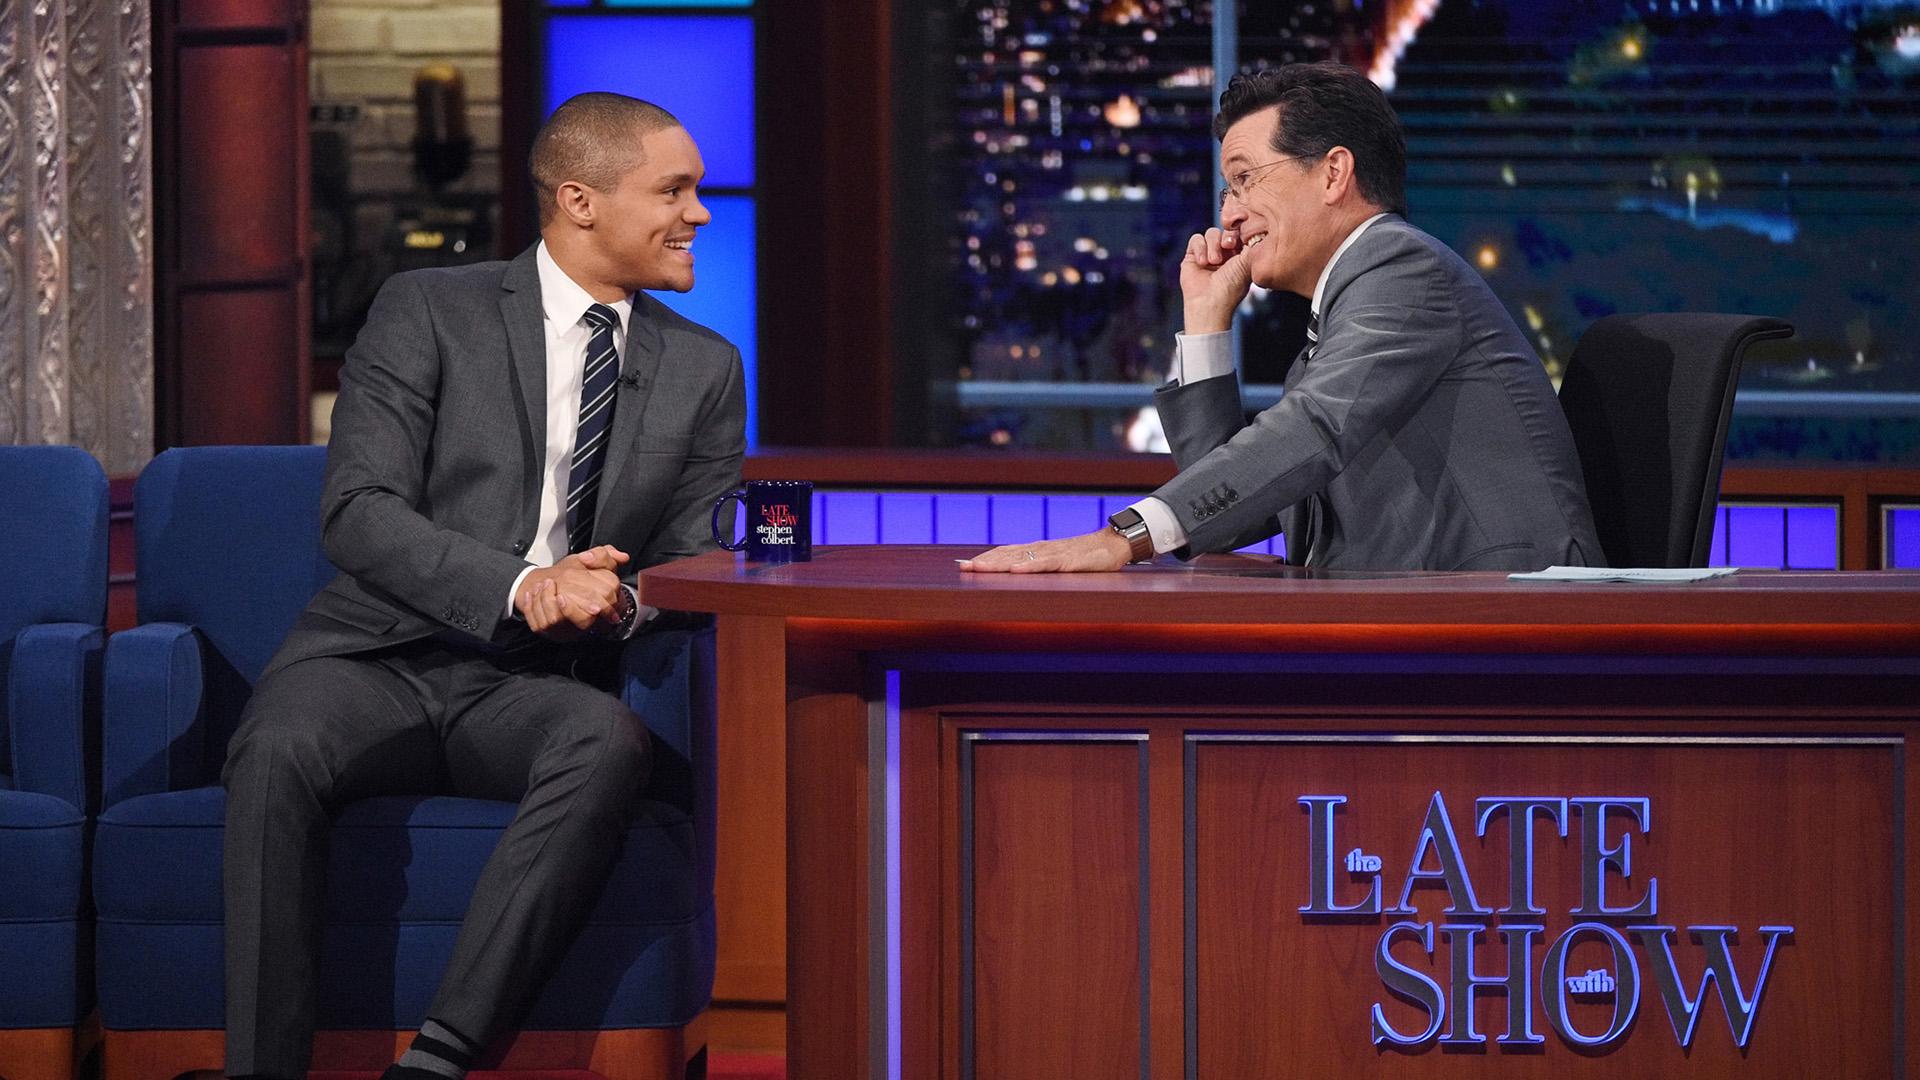 Trevor Noah and Stephen Colbert